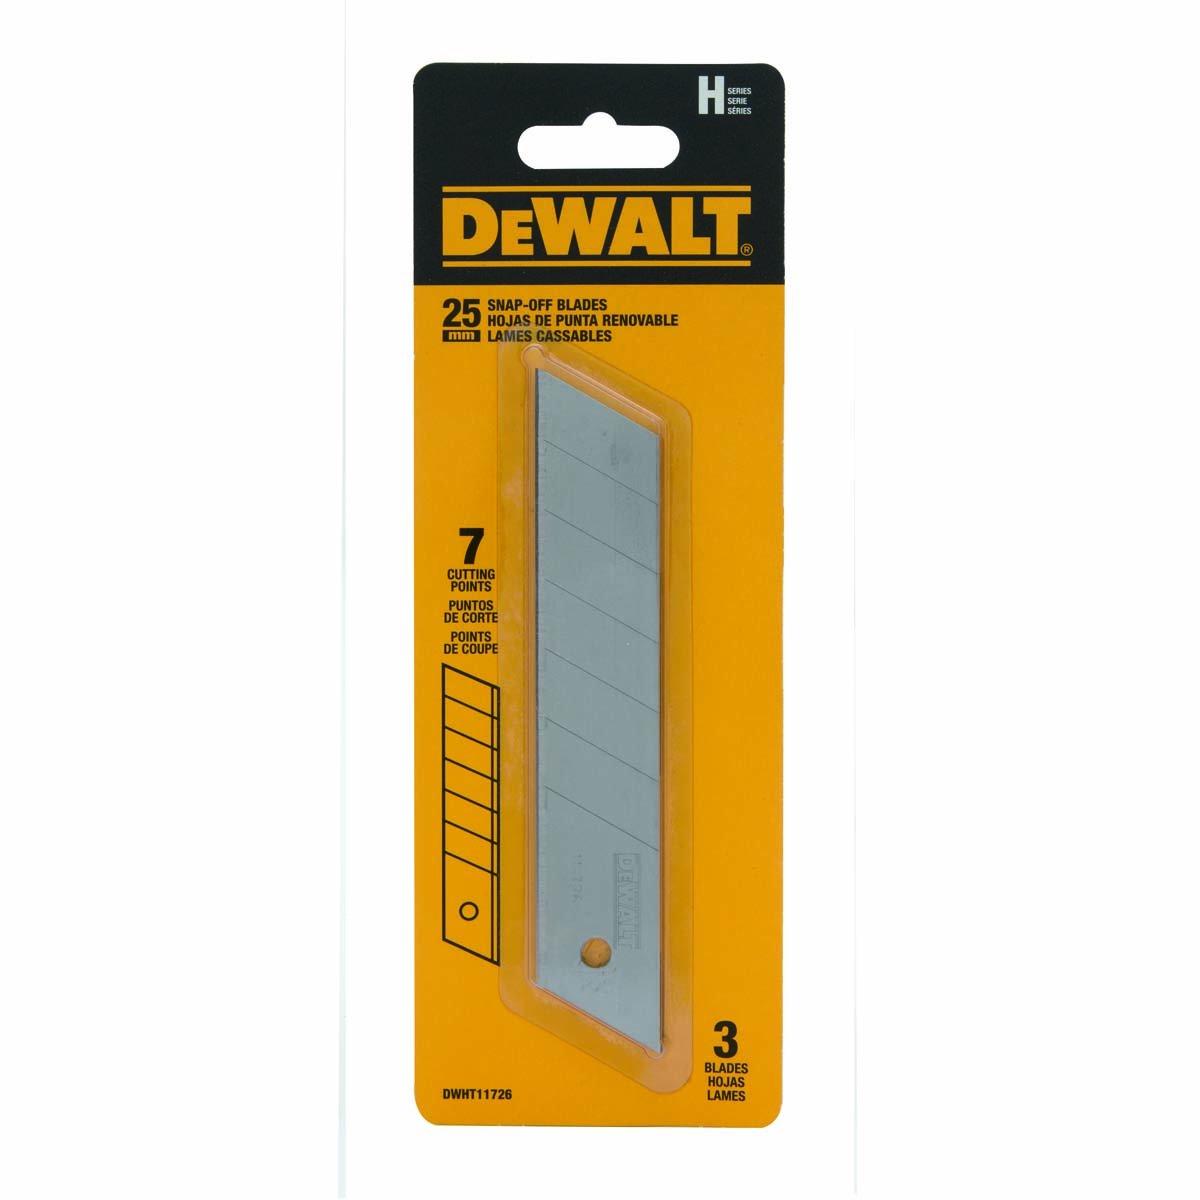 DEWALT 25 mm Snap Blades